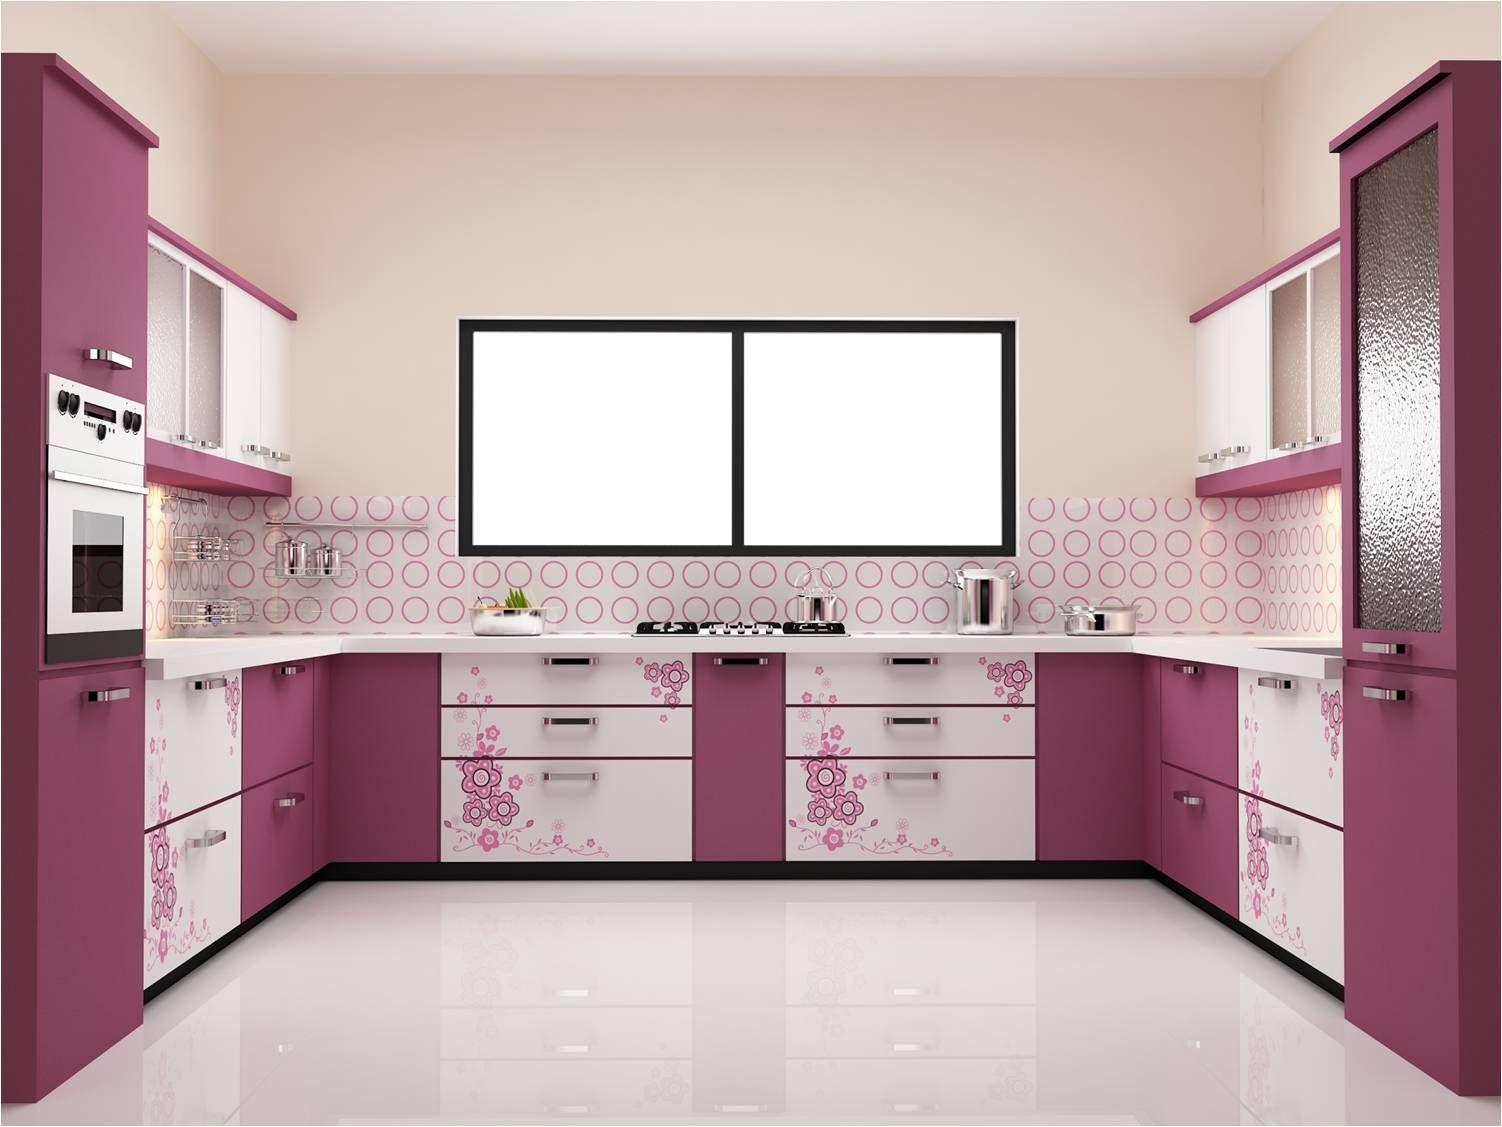 Designs Of Modular Kitchen Cabinets  Kitchen Cabinets  Pinterest Endearing Design Of Modular Kitchen Cabinets Design Inspiration